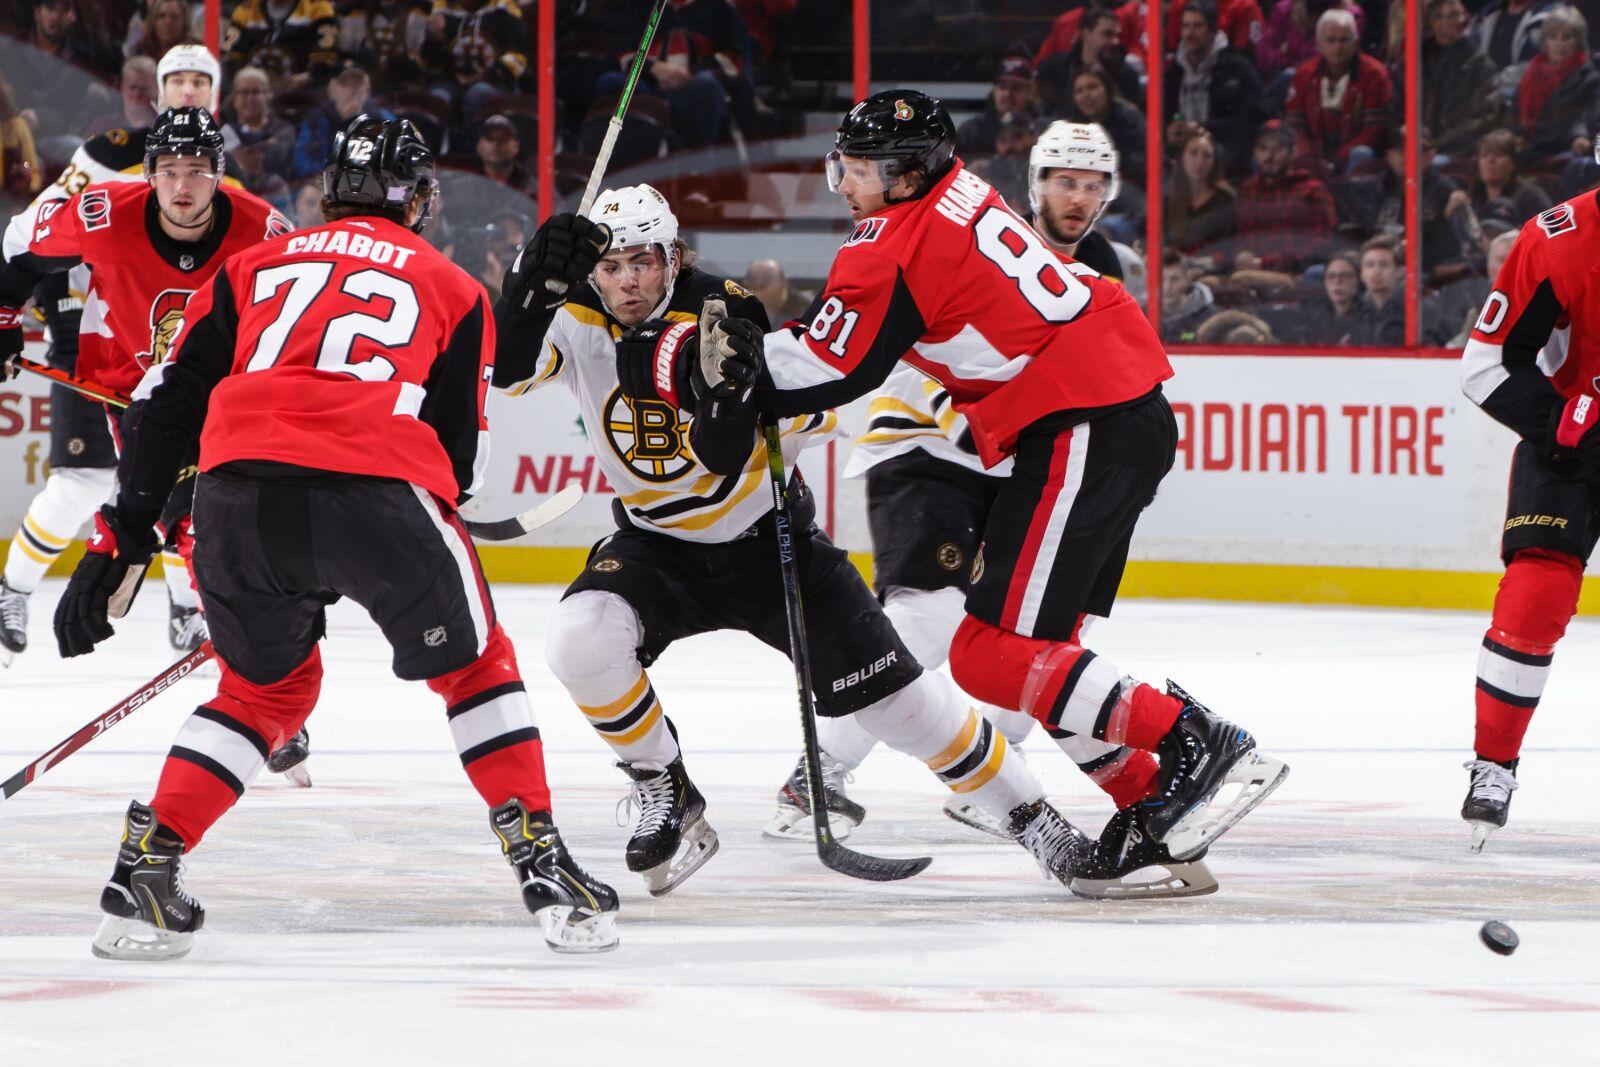 Game Preview: Senators vs Bruins